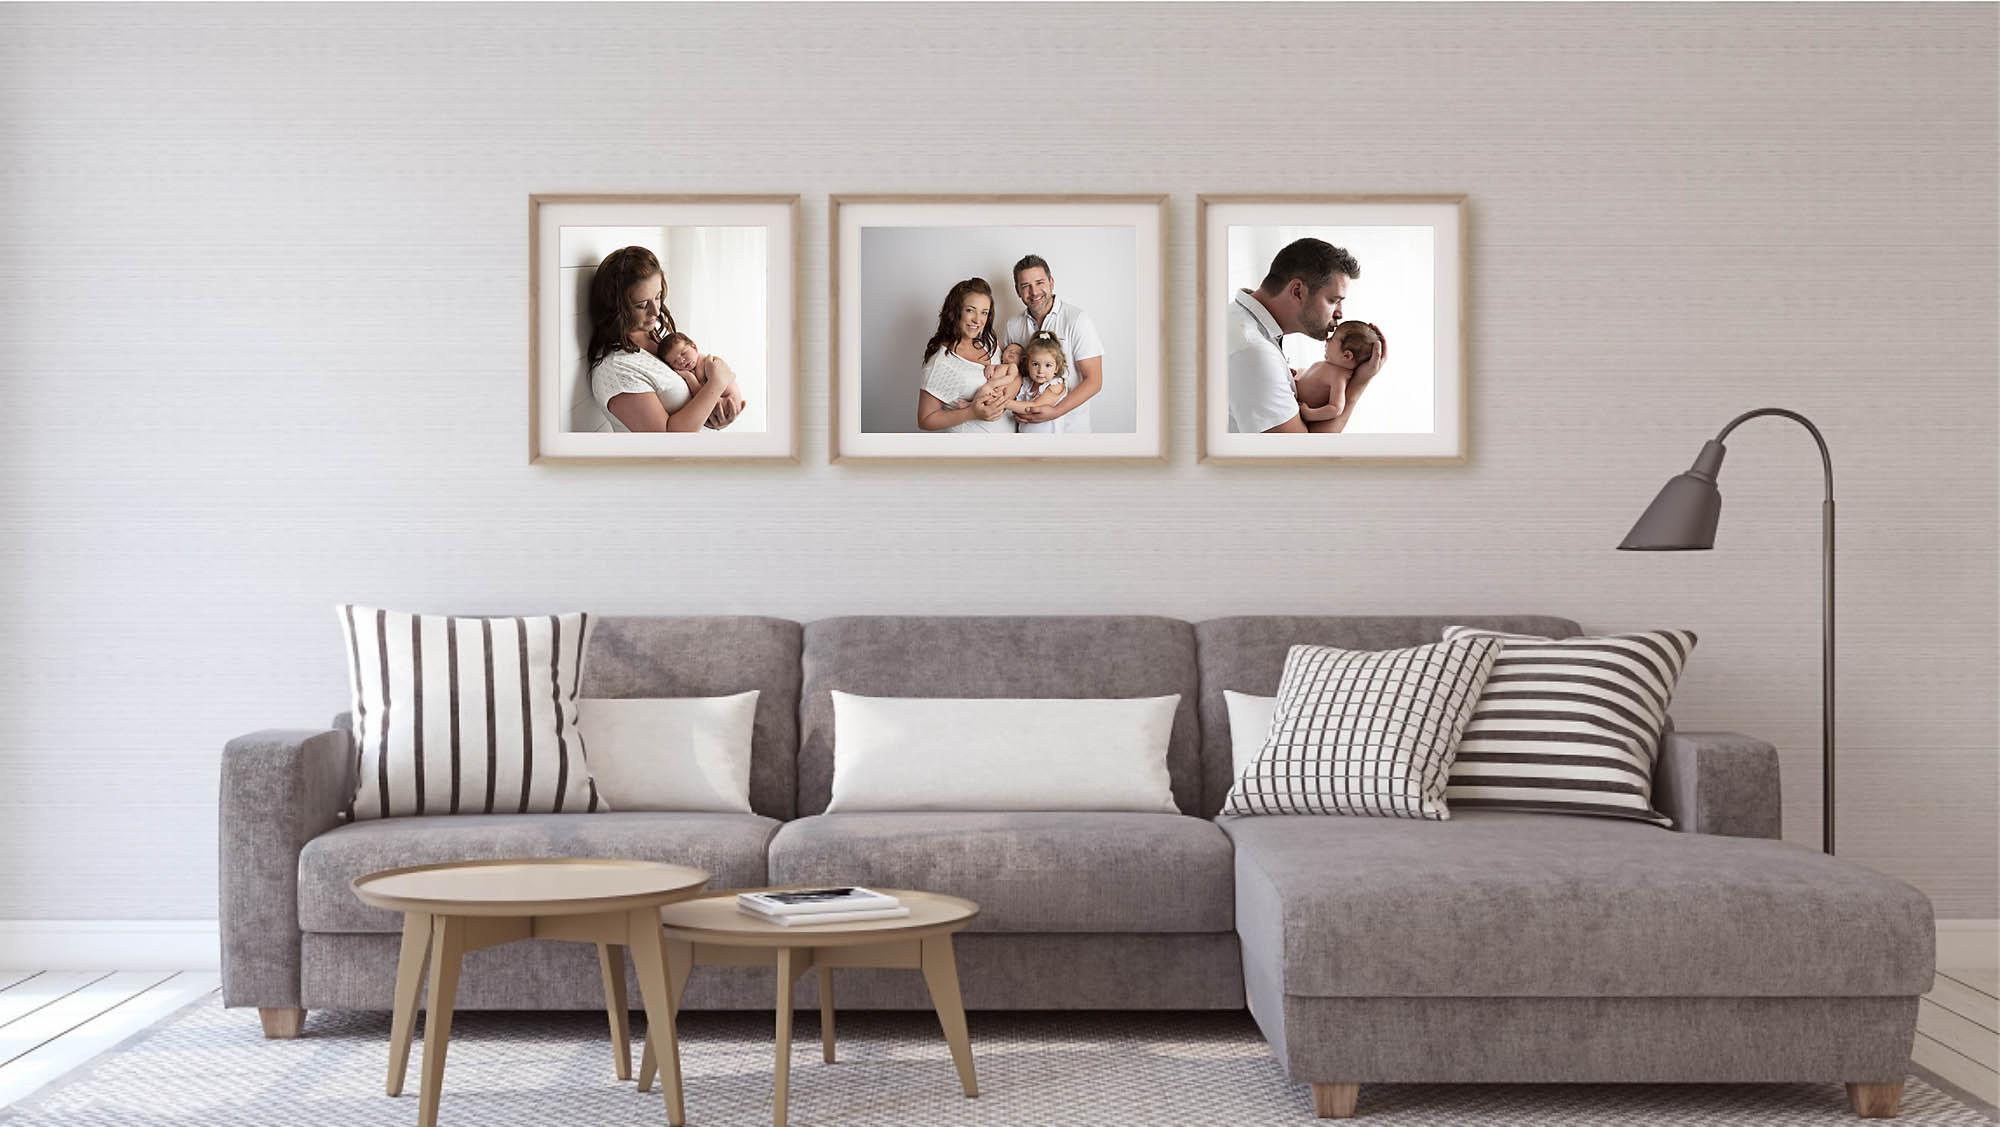 wall arte 3 framed